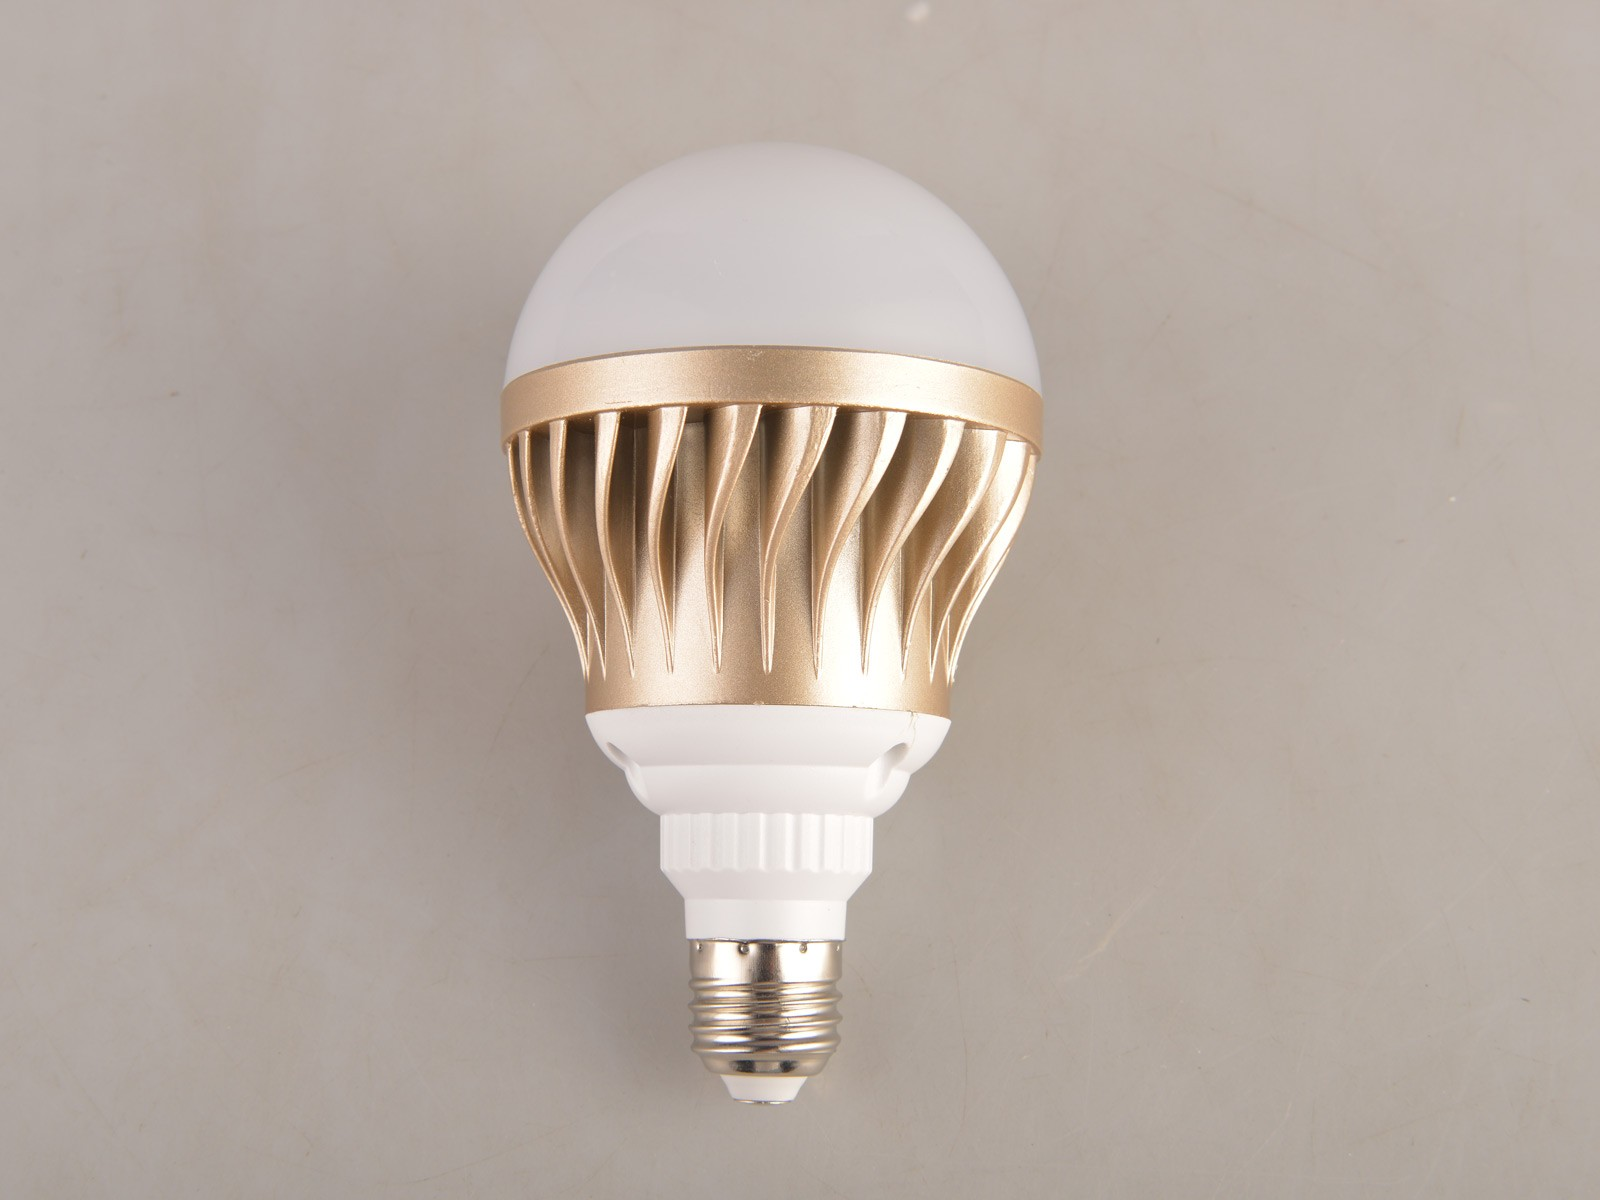 led照明灯价格—led照明灯的产品价格介绍